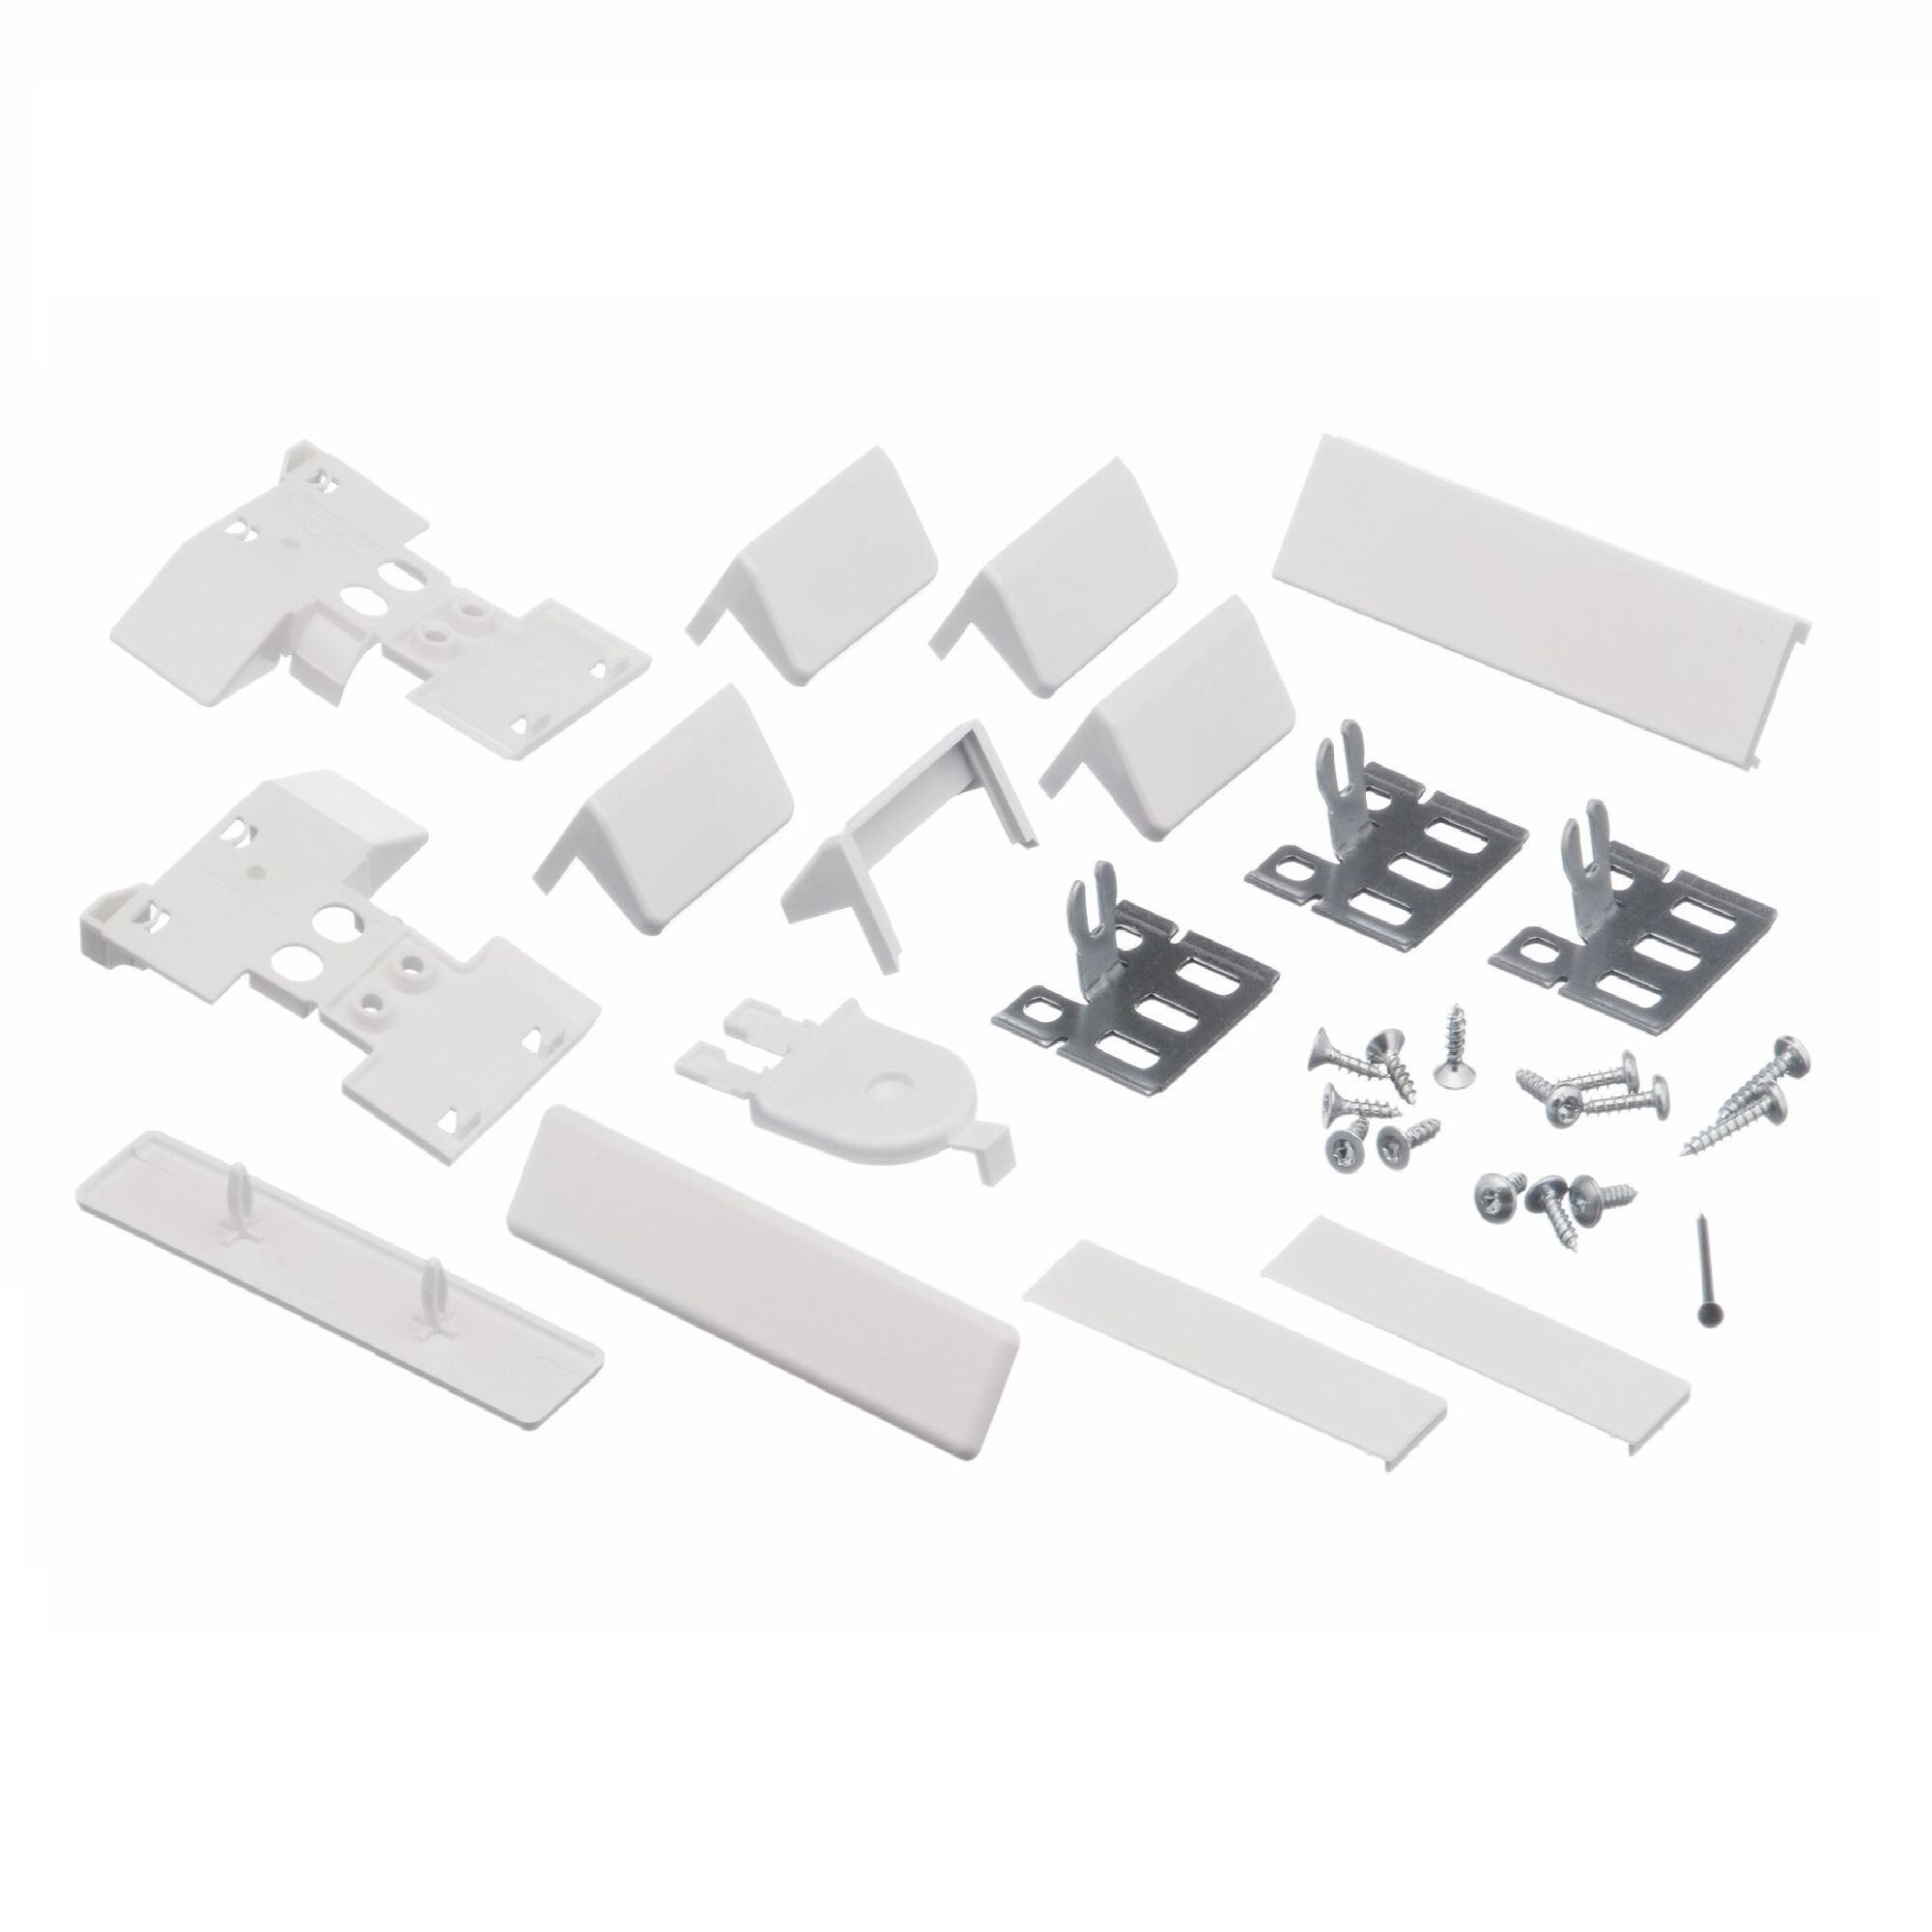 Bosch Neff Siemans Fridge Freezer Cupboard Decor Door Fixing Integration Kit